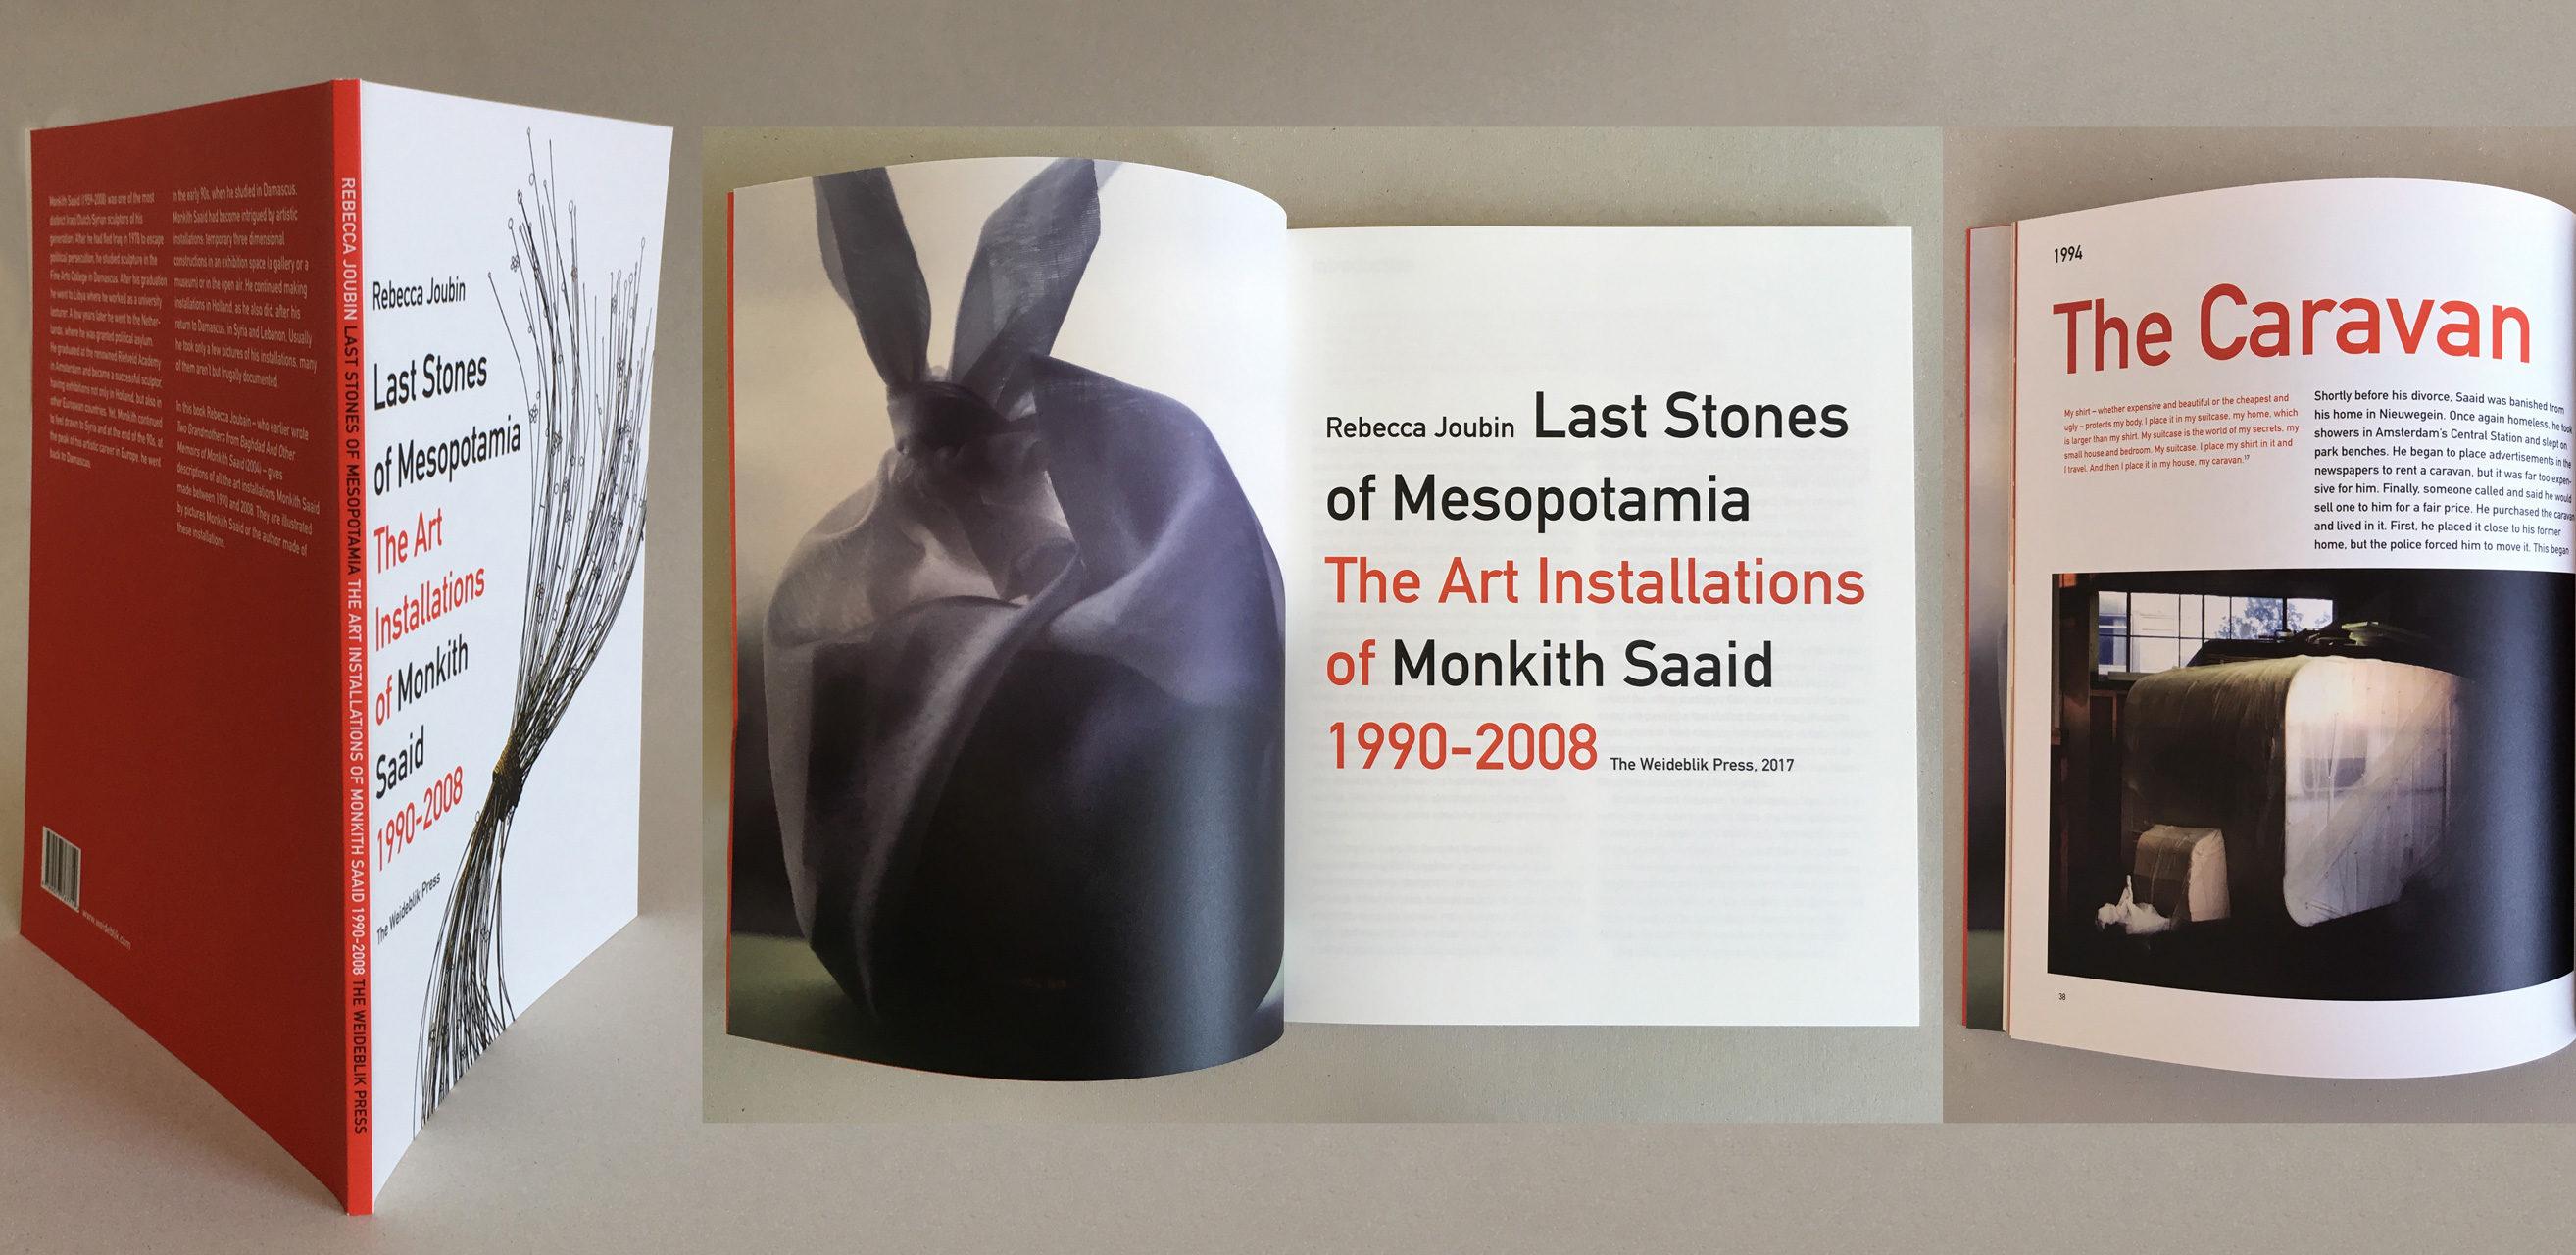 The Art  Installations of Monkith Saaid